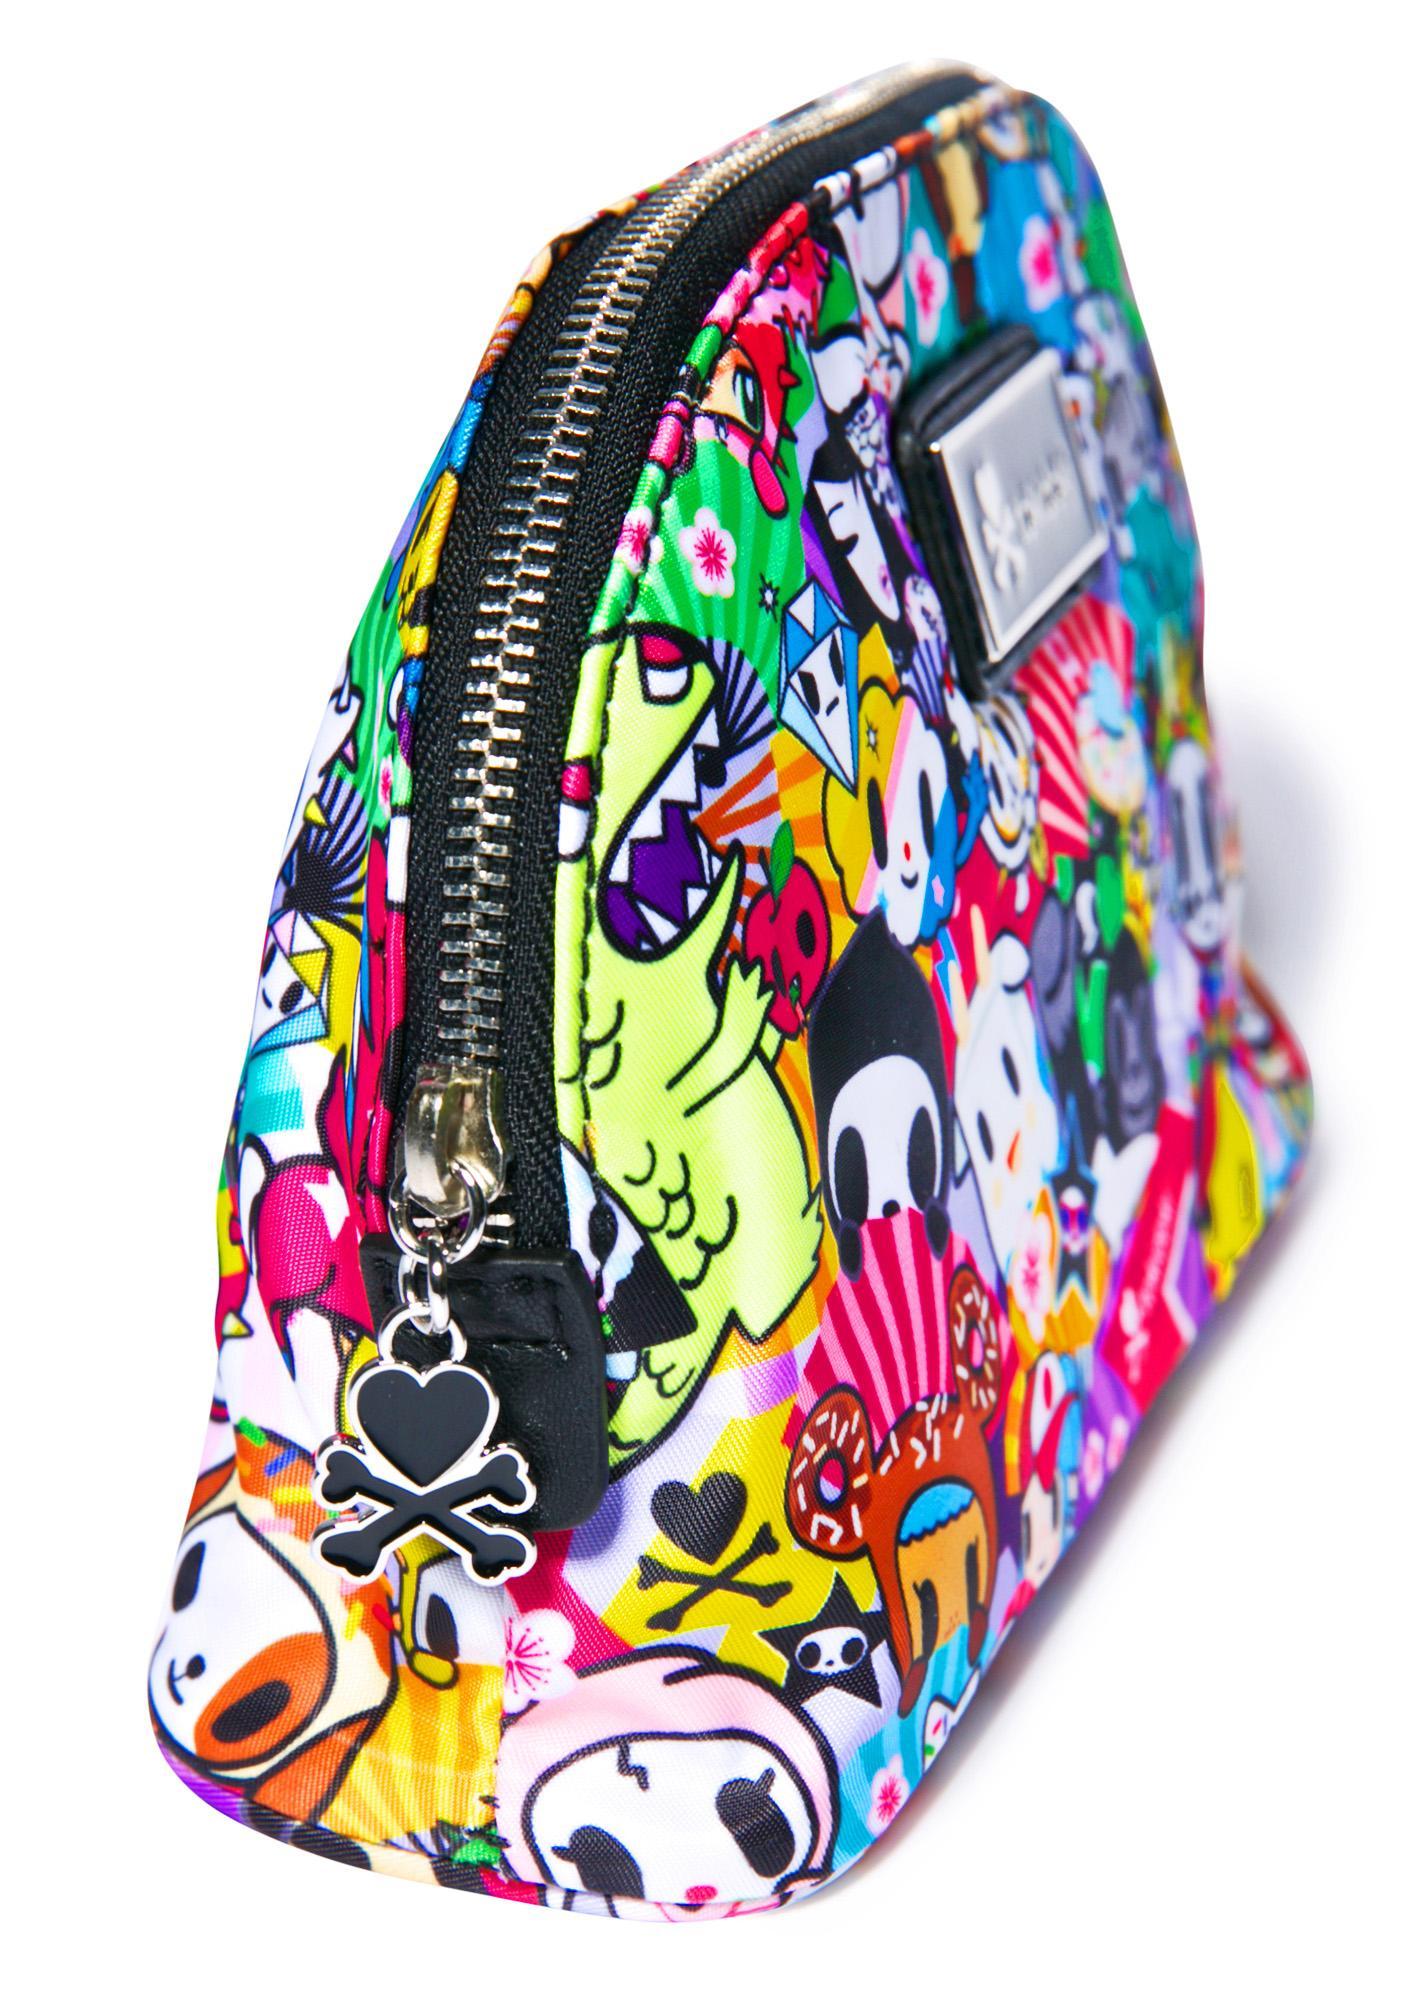 Tokidoki Superfan Collection Cosmetic Bag